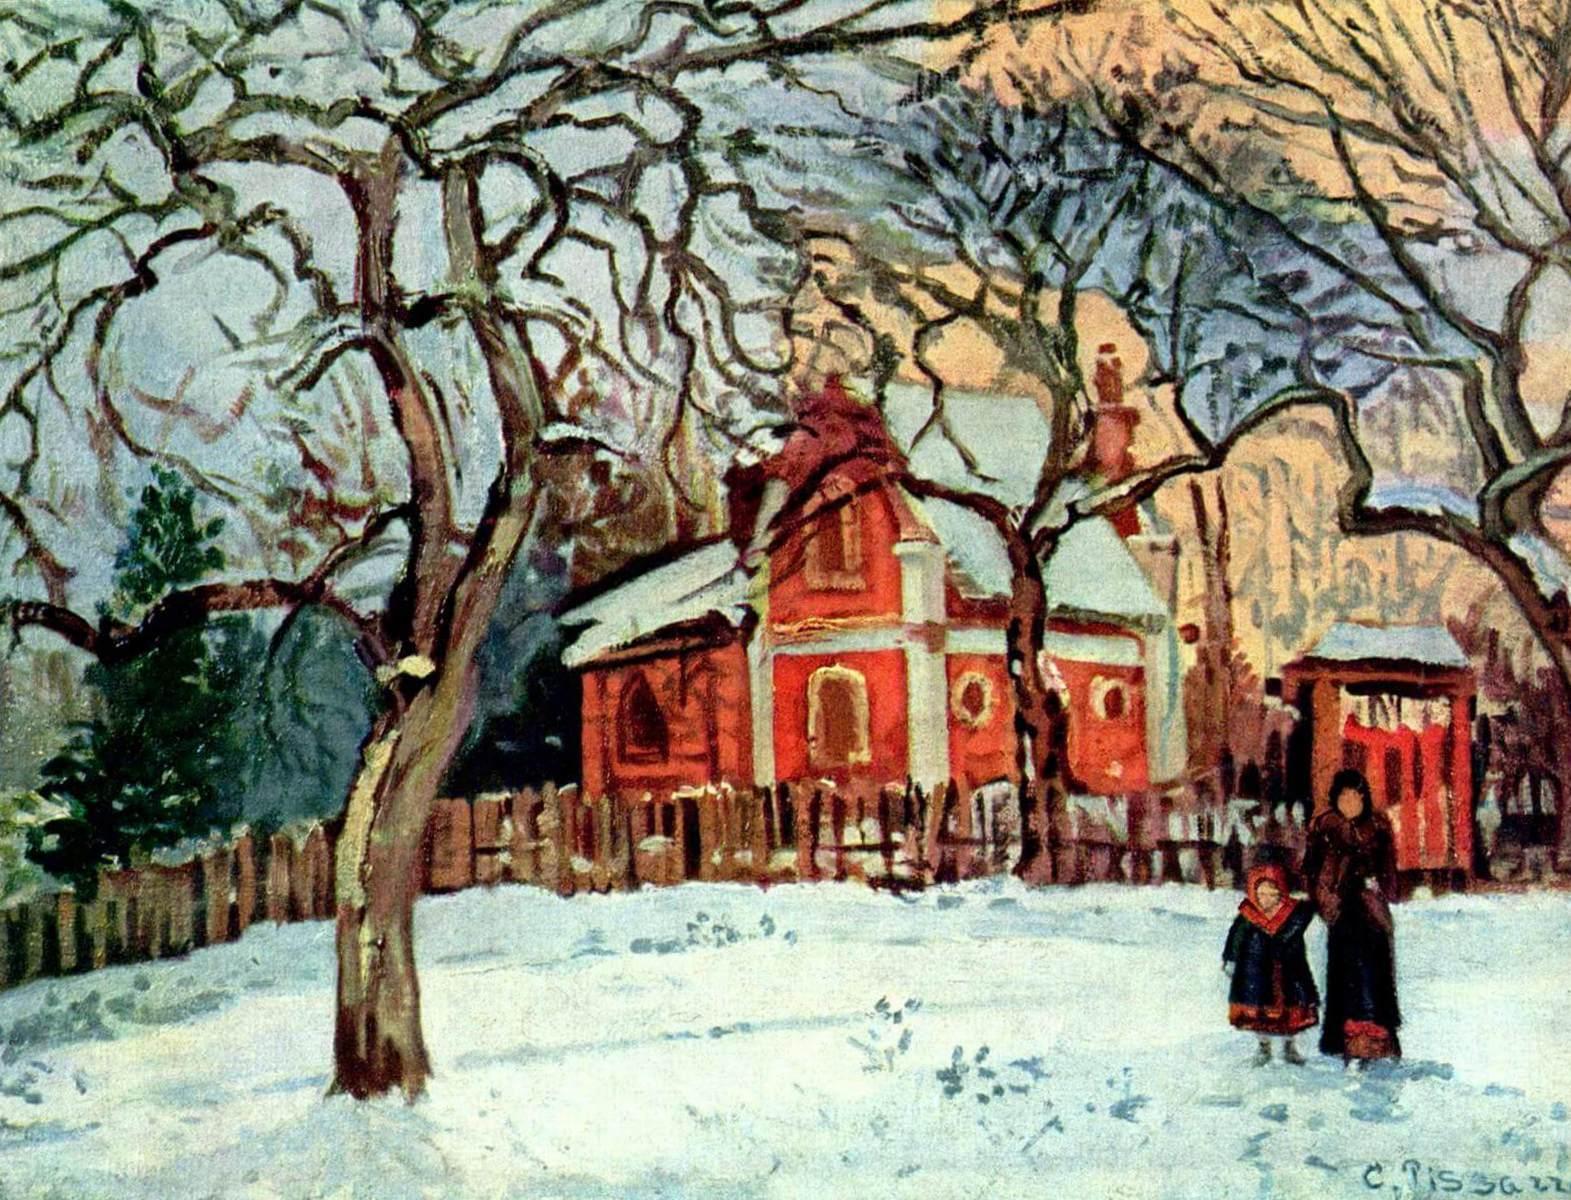 Каштаны, зима - Камиль Писсарро (1872, Музей д'Орсэ, Париж)